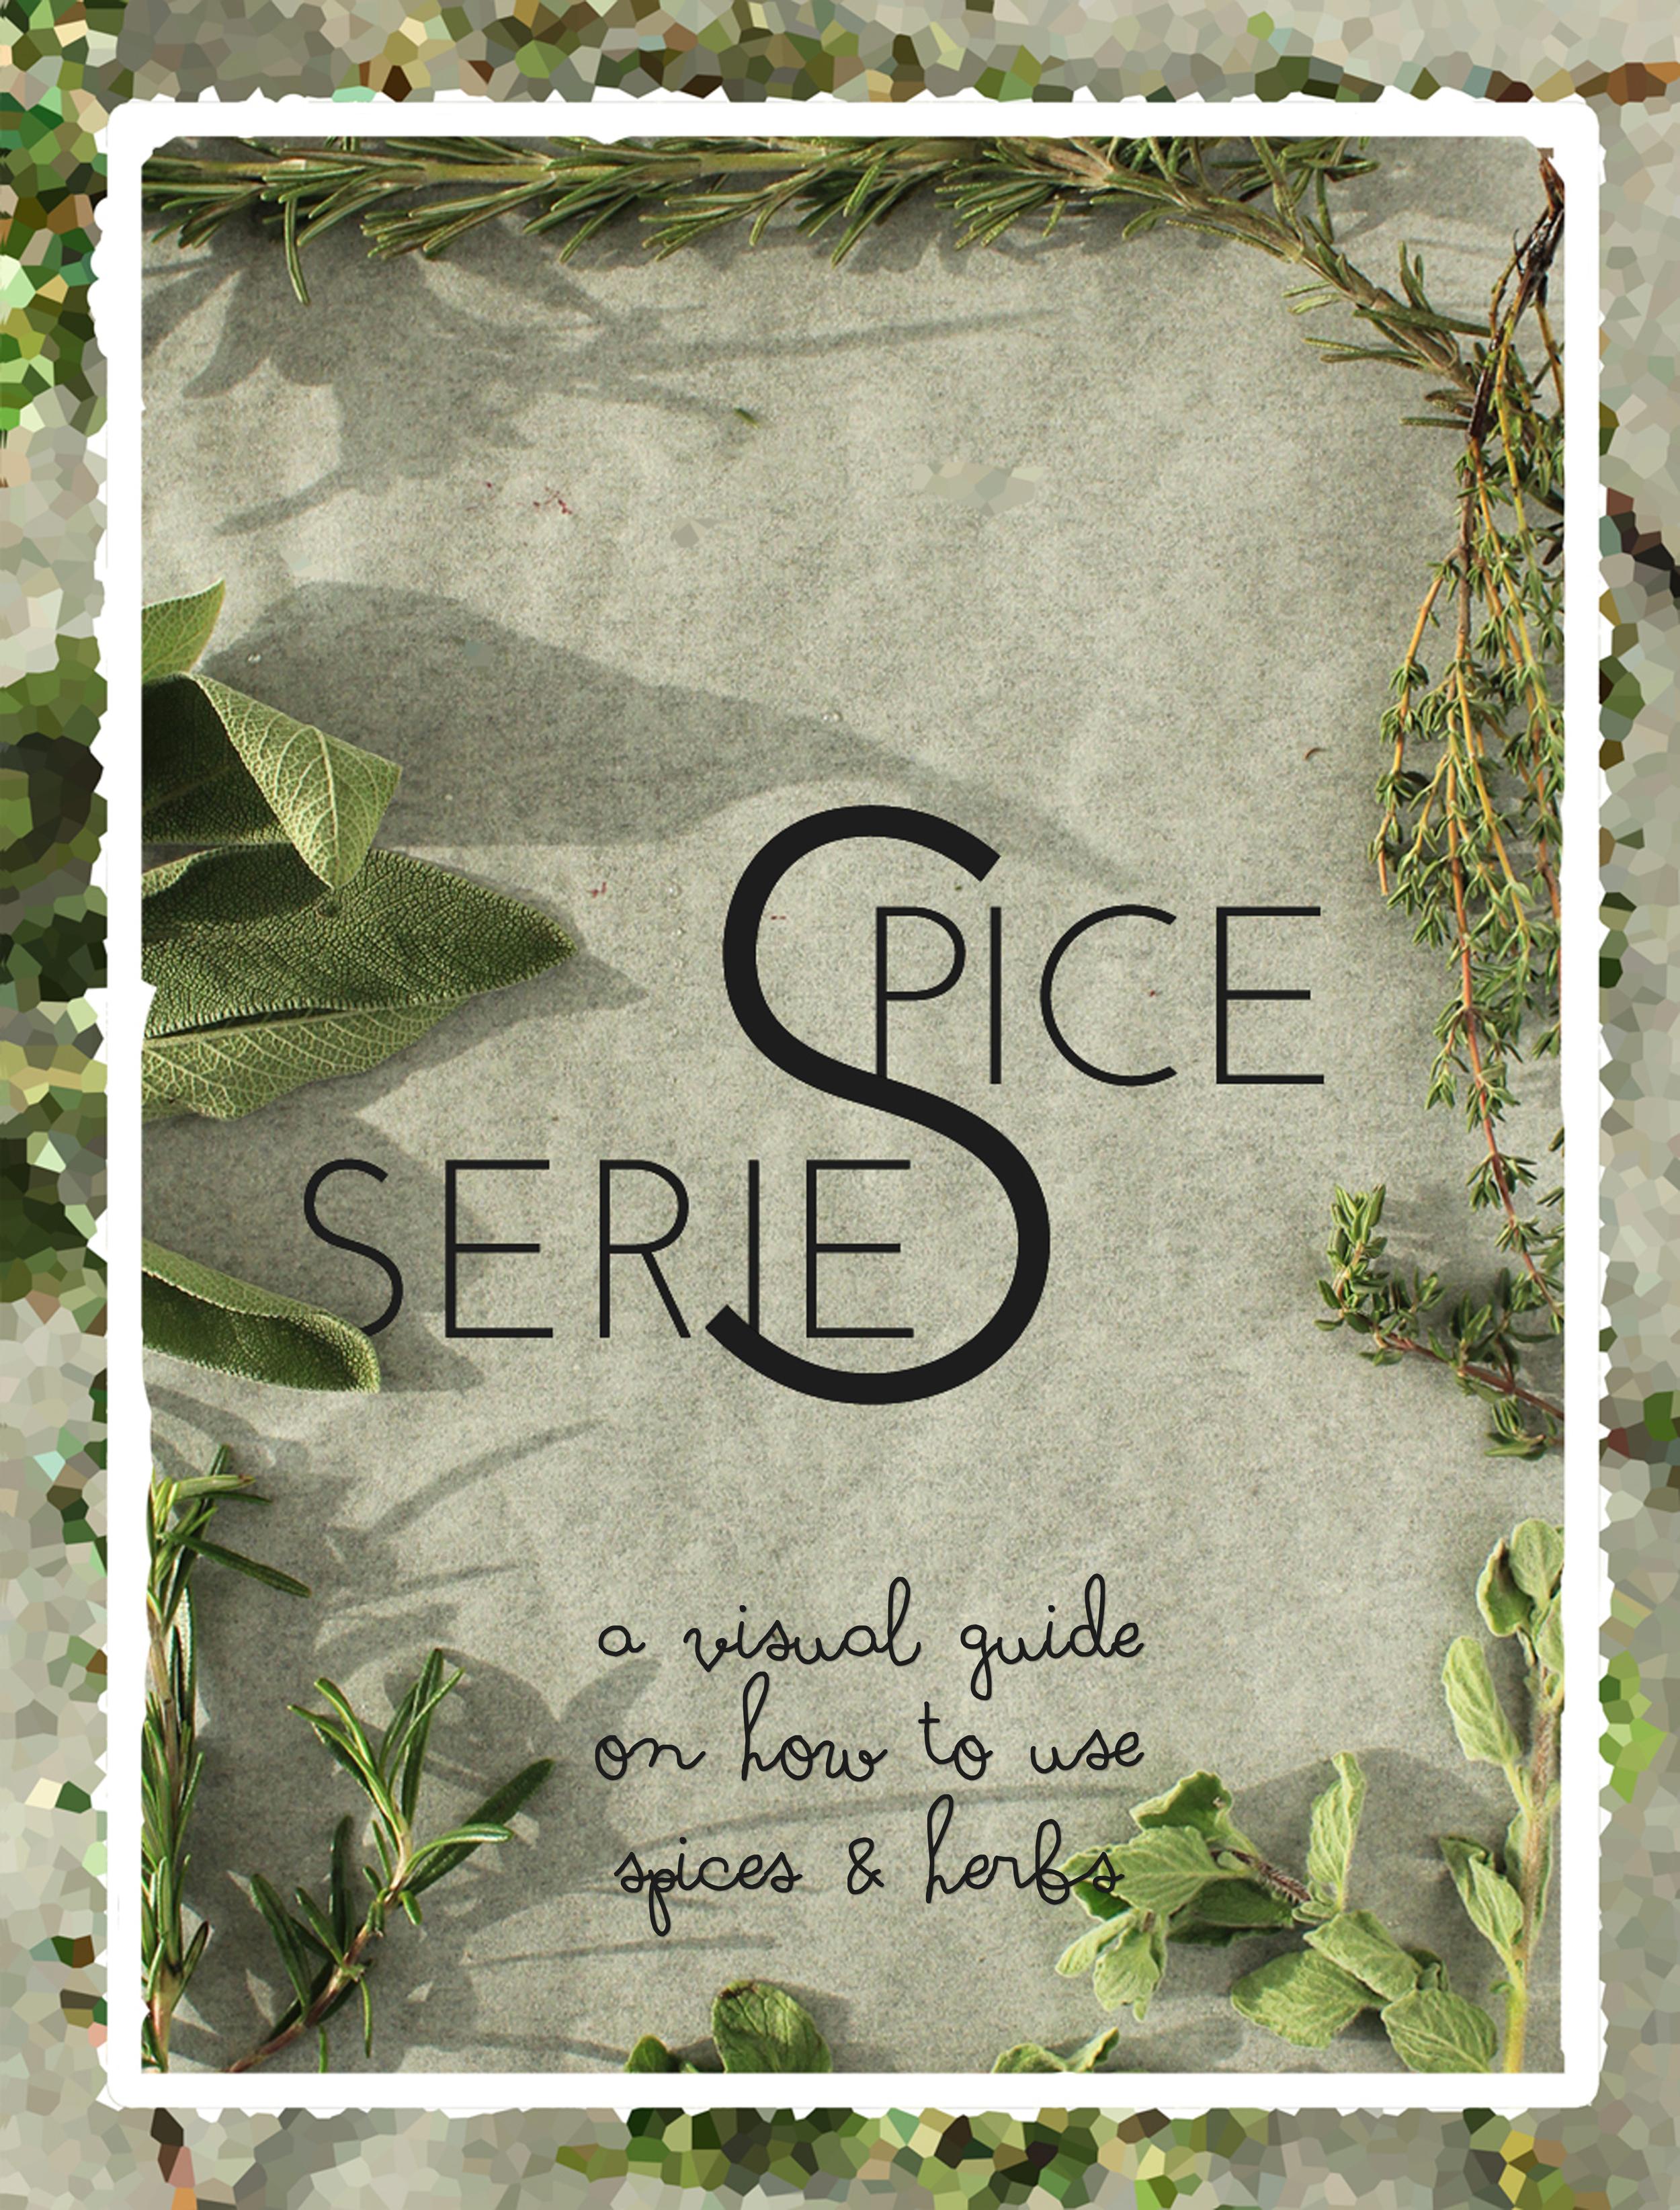 Spice Series: ένας οπτικός οδηγός για το πως να χρησιμοποιείτε τα μπαχαρικά σας | In Whirl of Inspiration